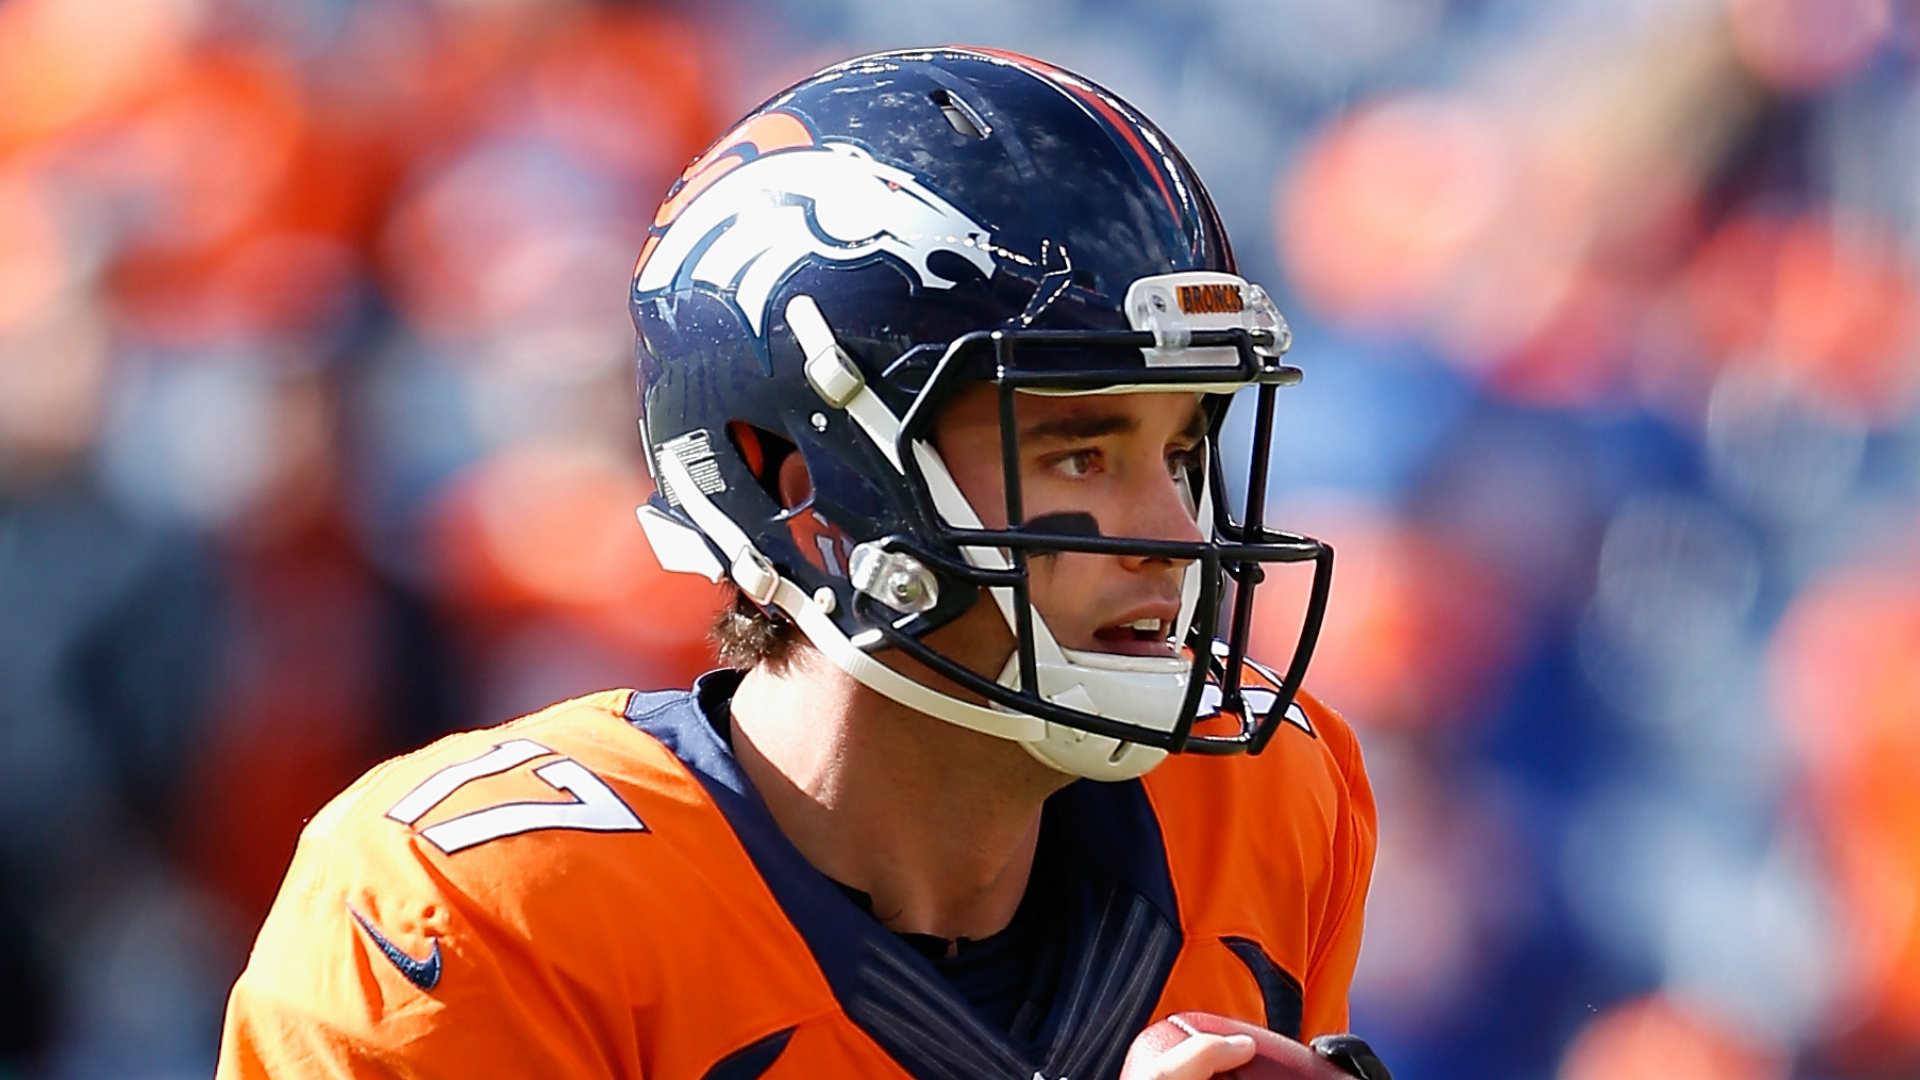 Broncos name Brock Osweiler starting QB vs. Eagles